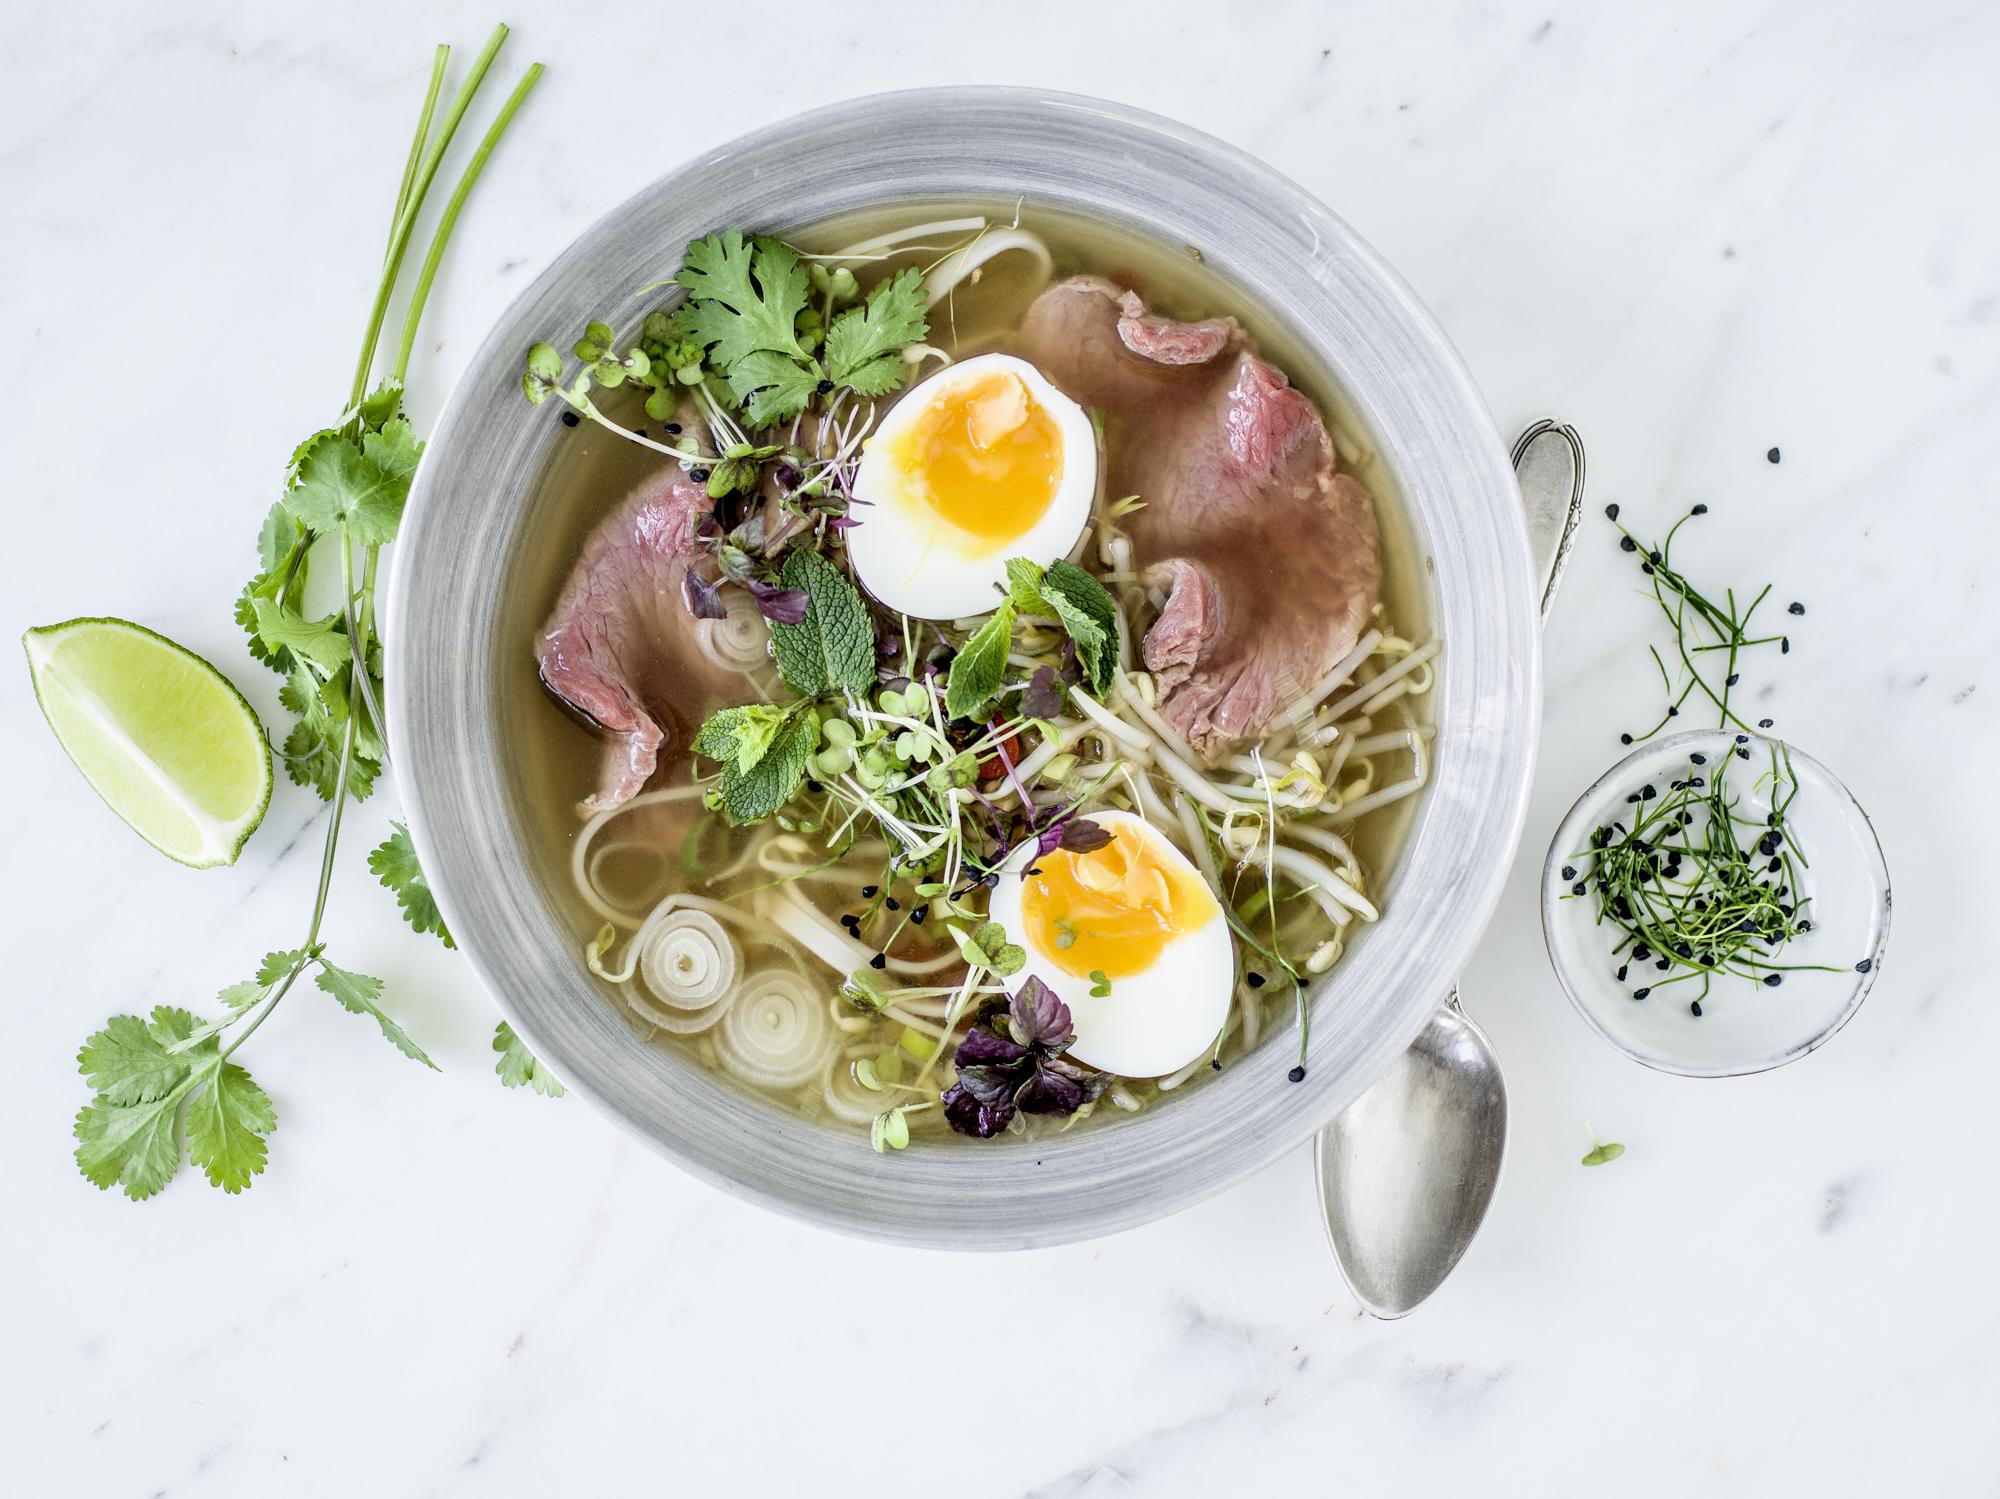 Food-Fotografie Microgreens, Stefan Schmidlin Fotograf Basel; Bild 9.jpg